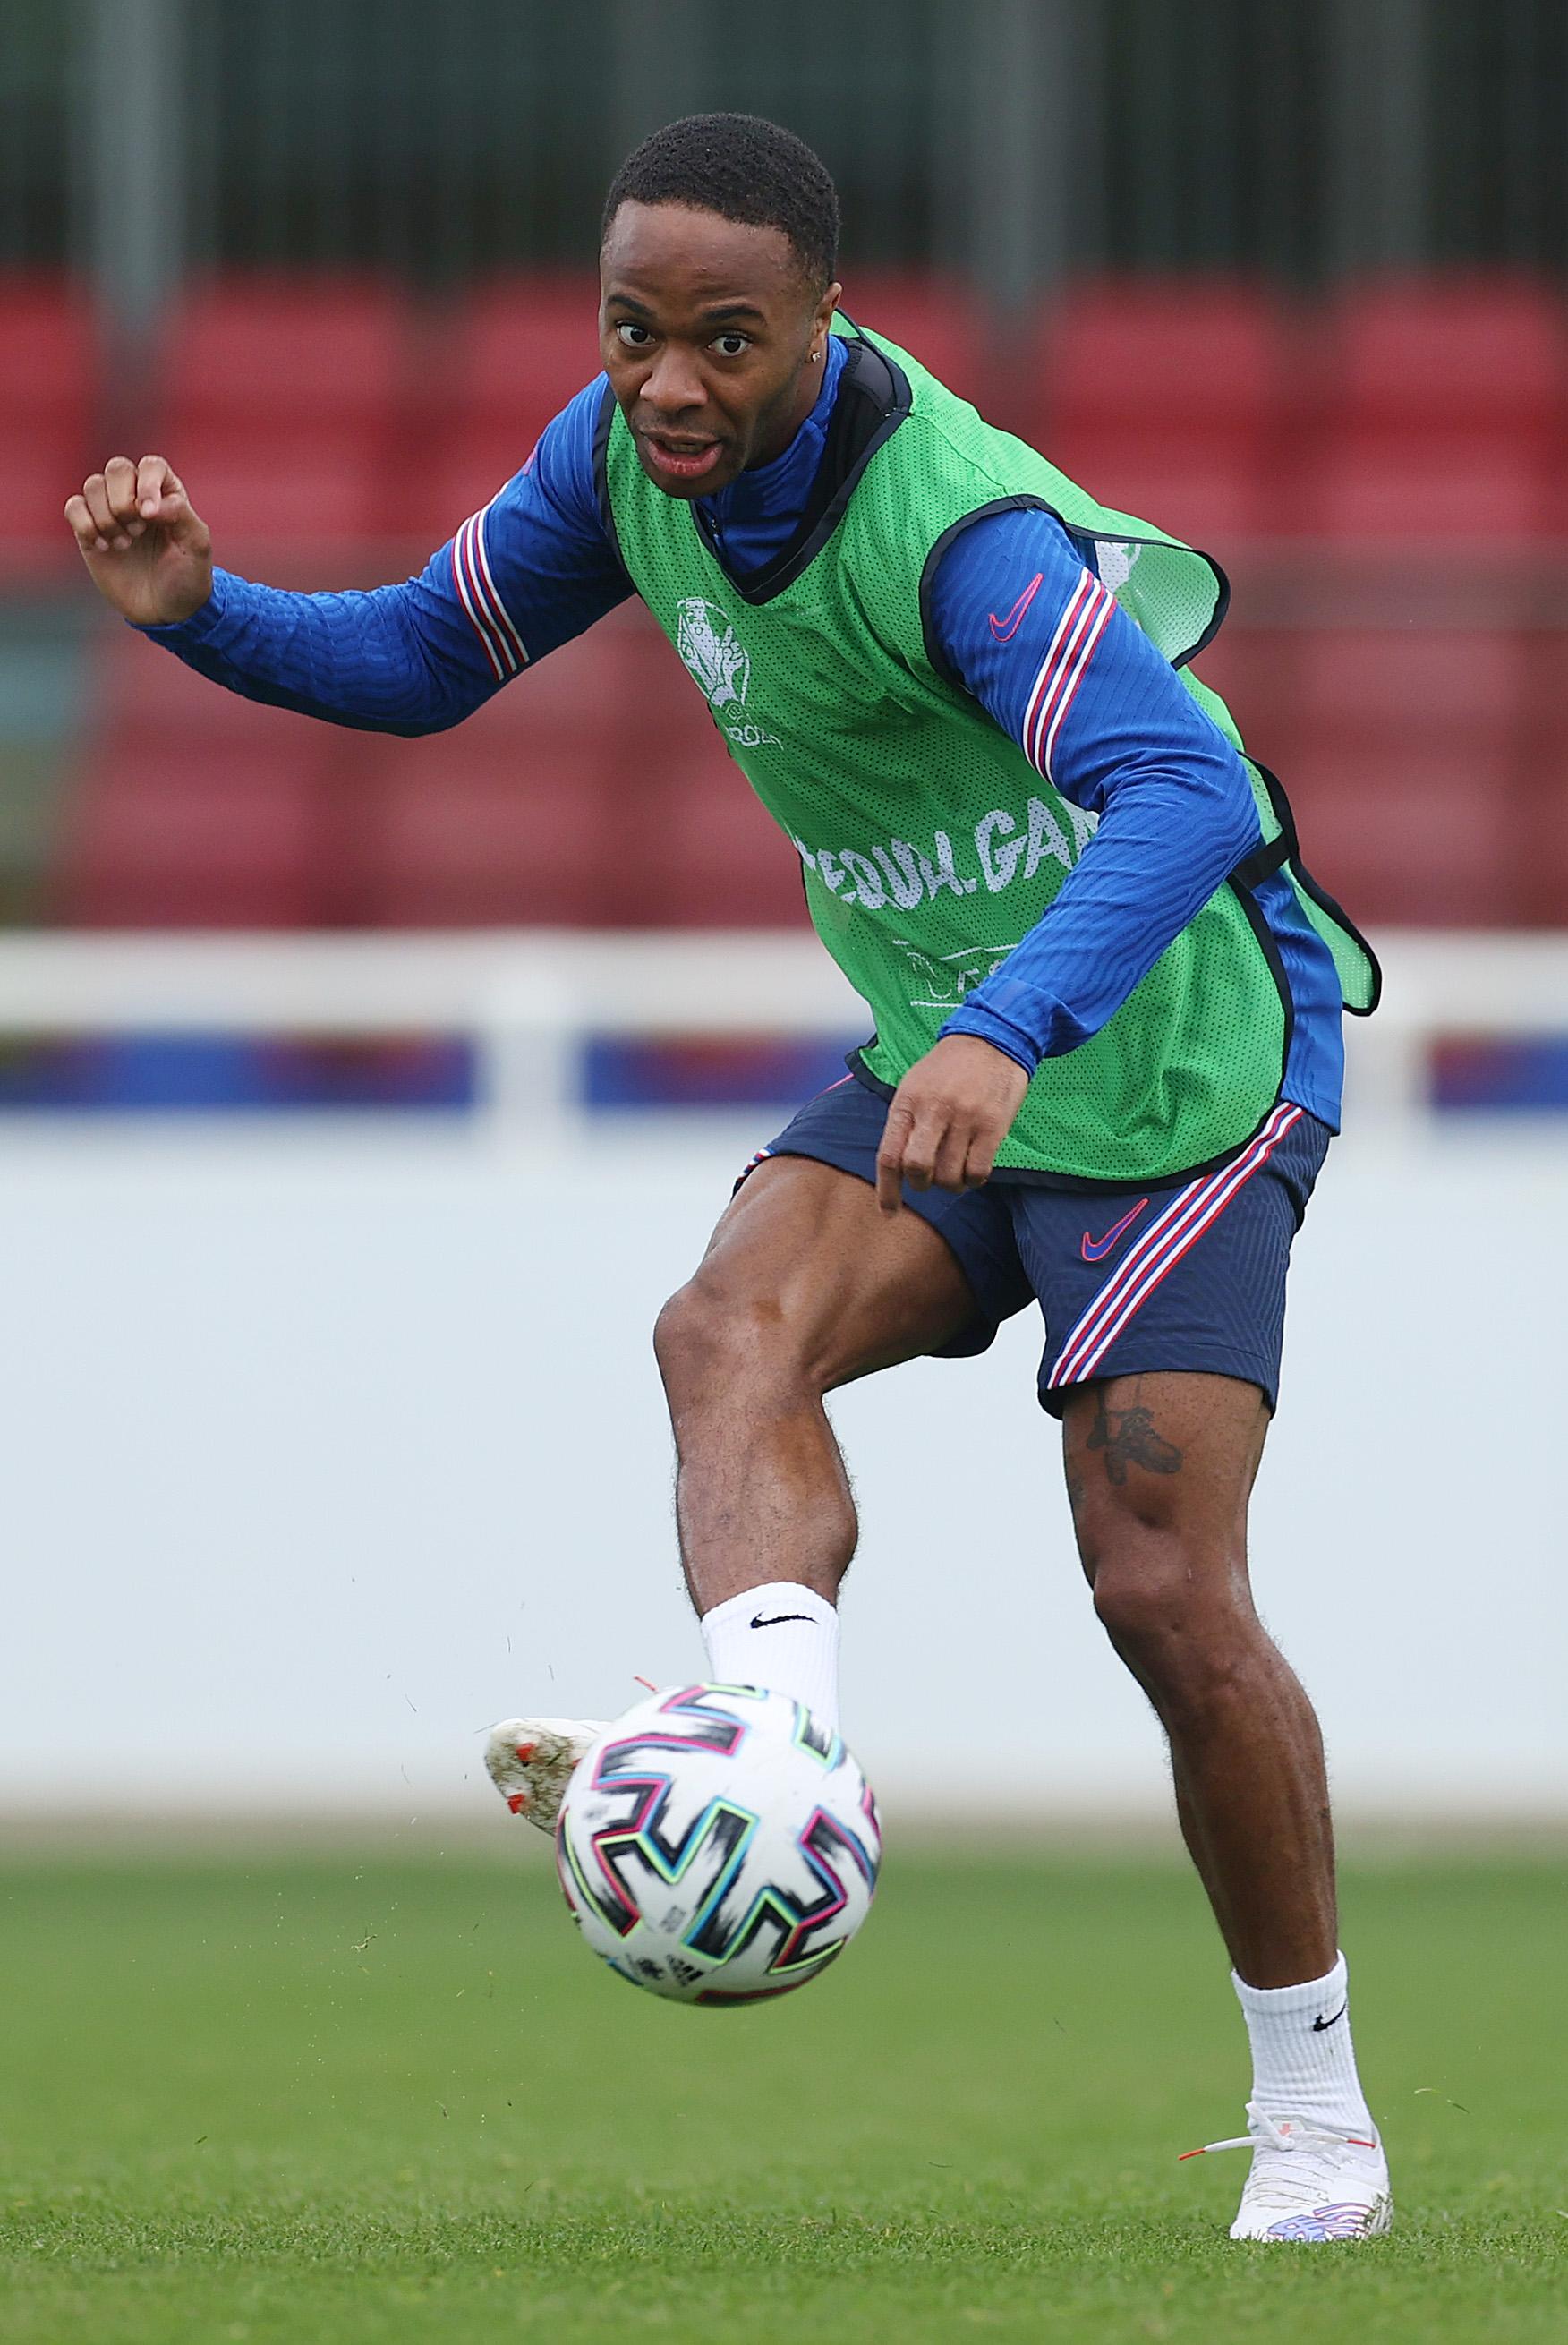 Raheem Sterling - England Training Camp - Euro 2020